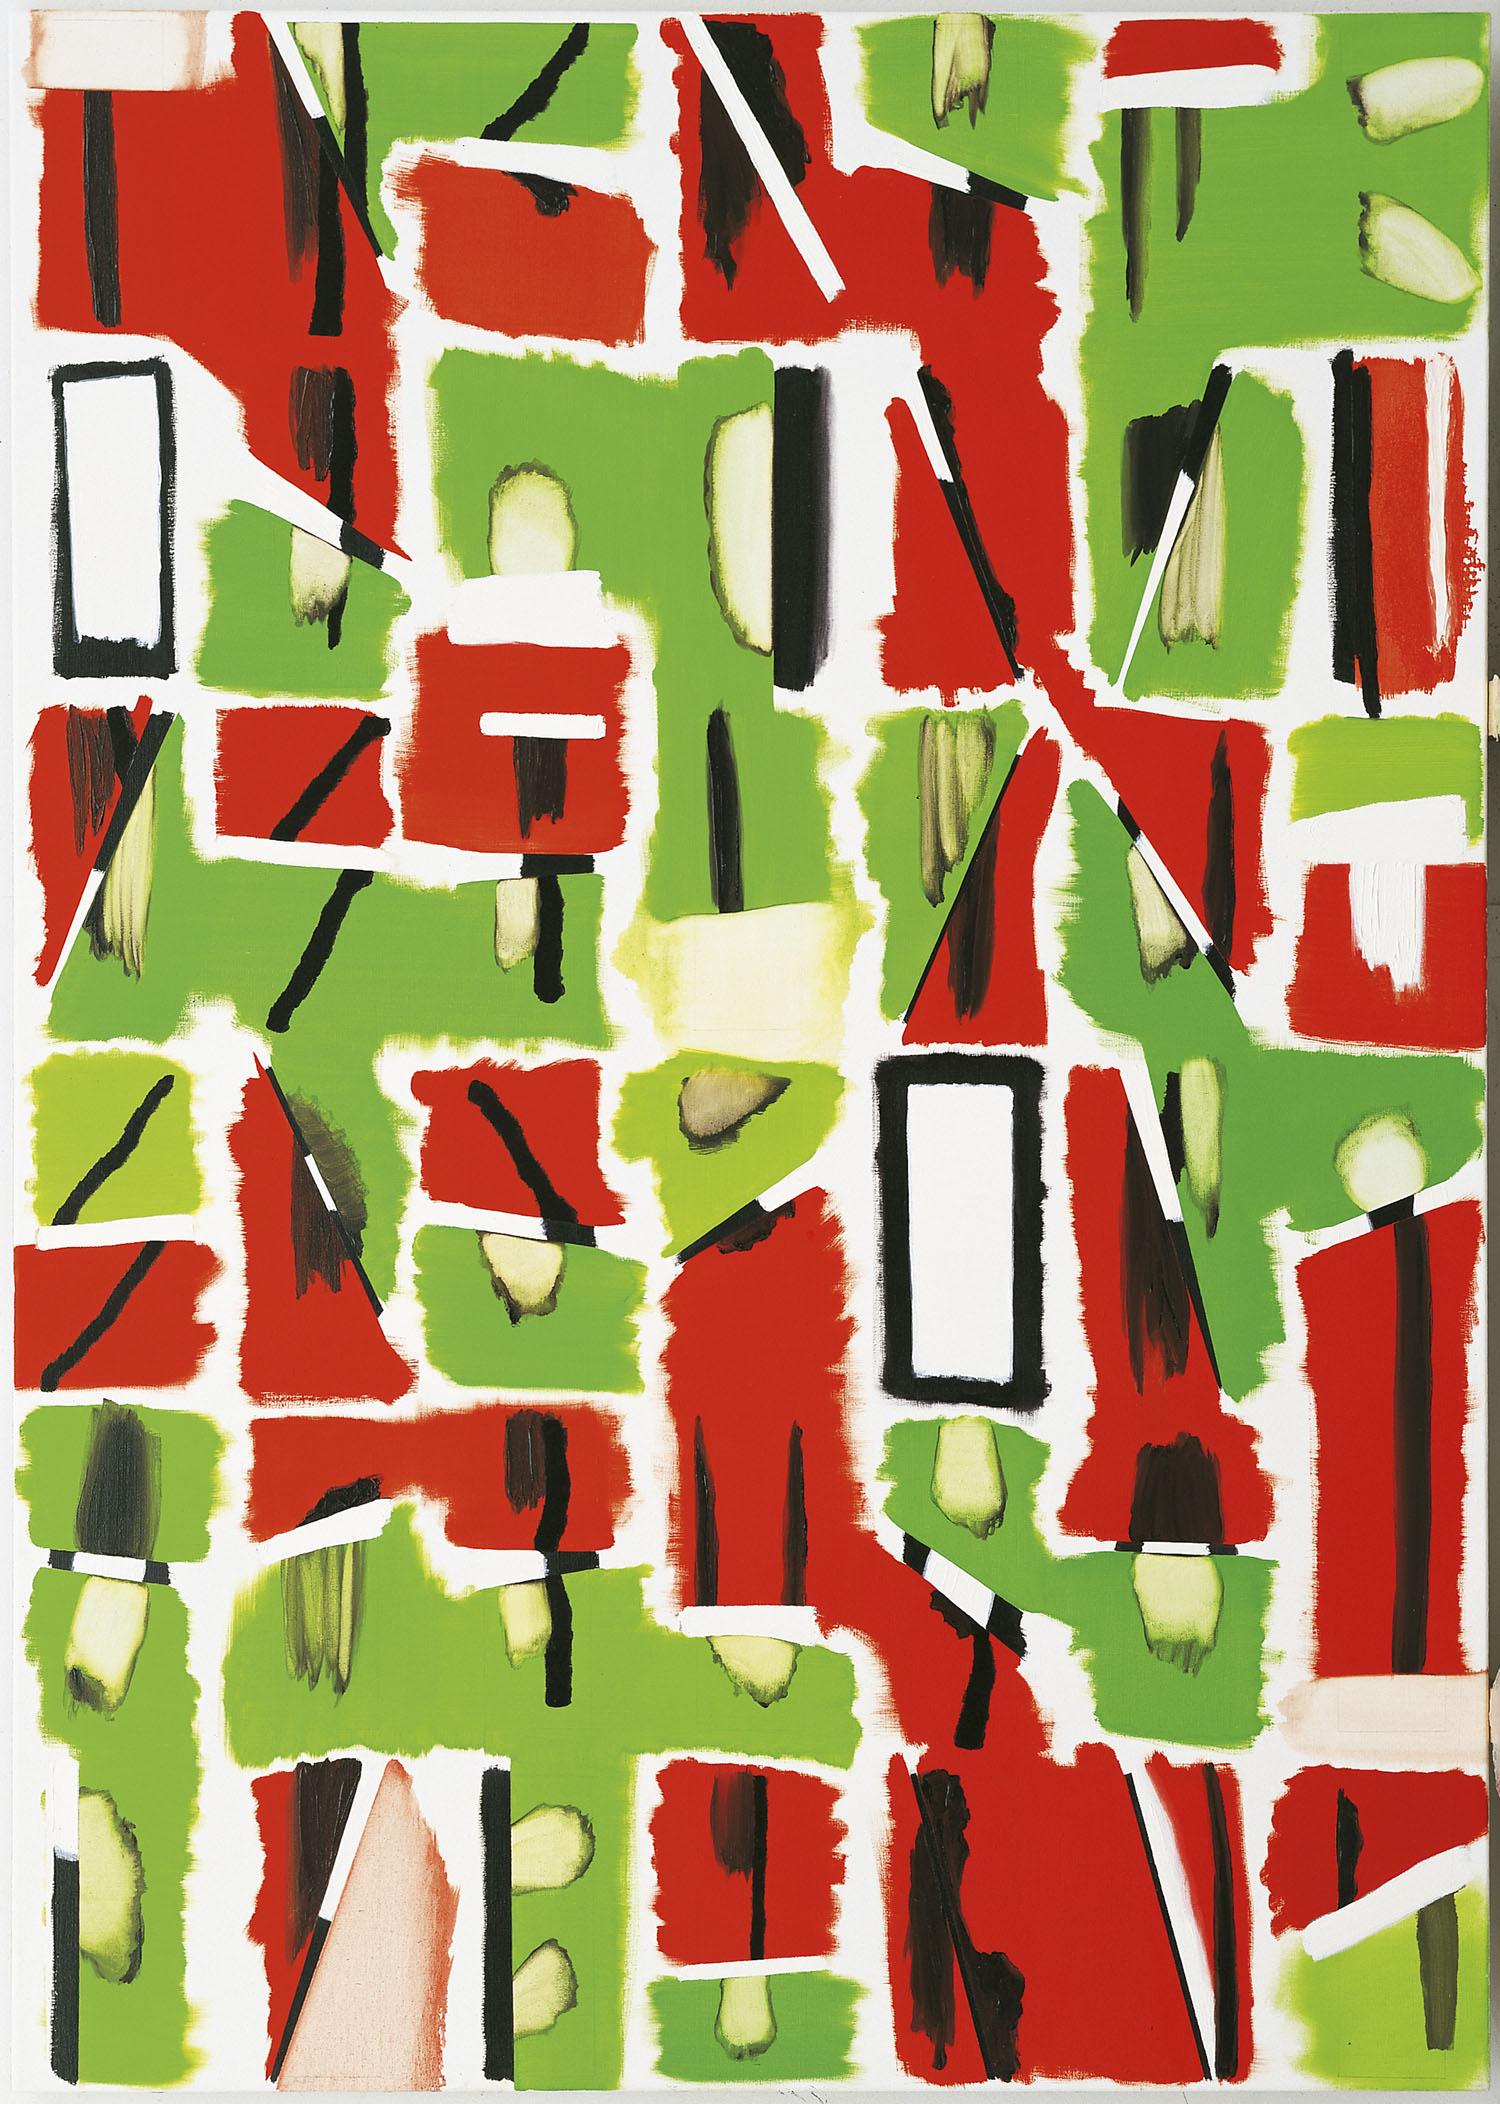 98.01.01 | Öl auf Leinwand | 1998 | 115 x 80 cm